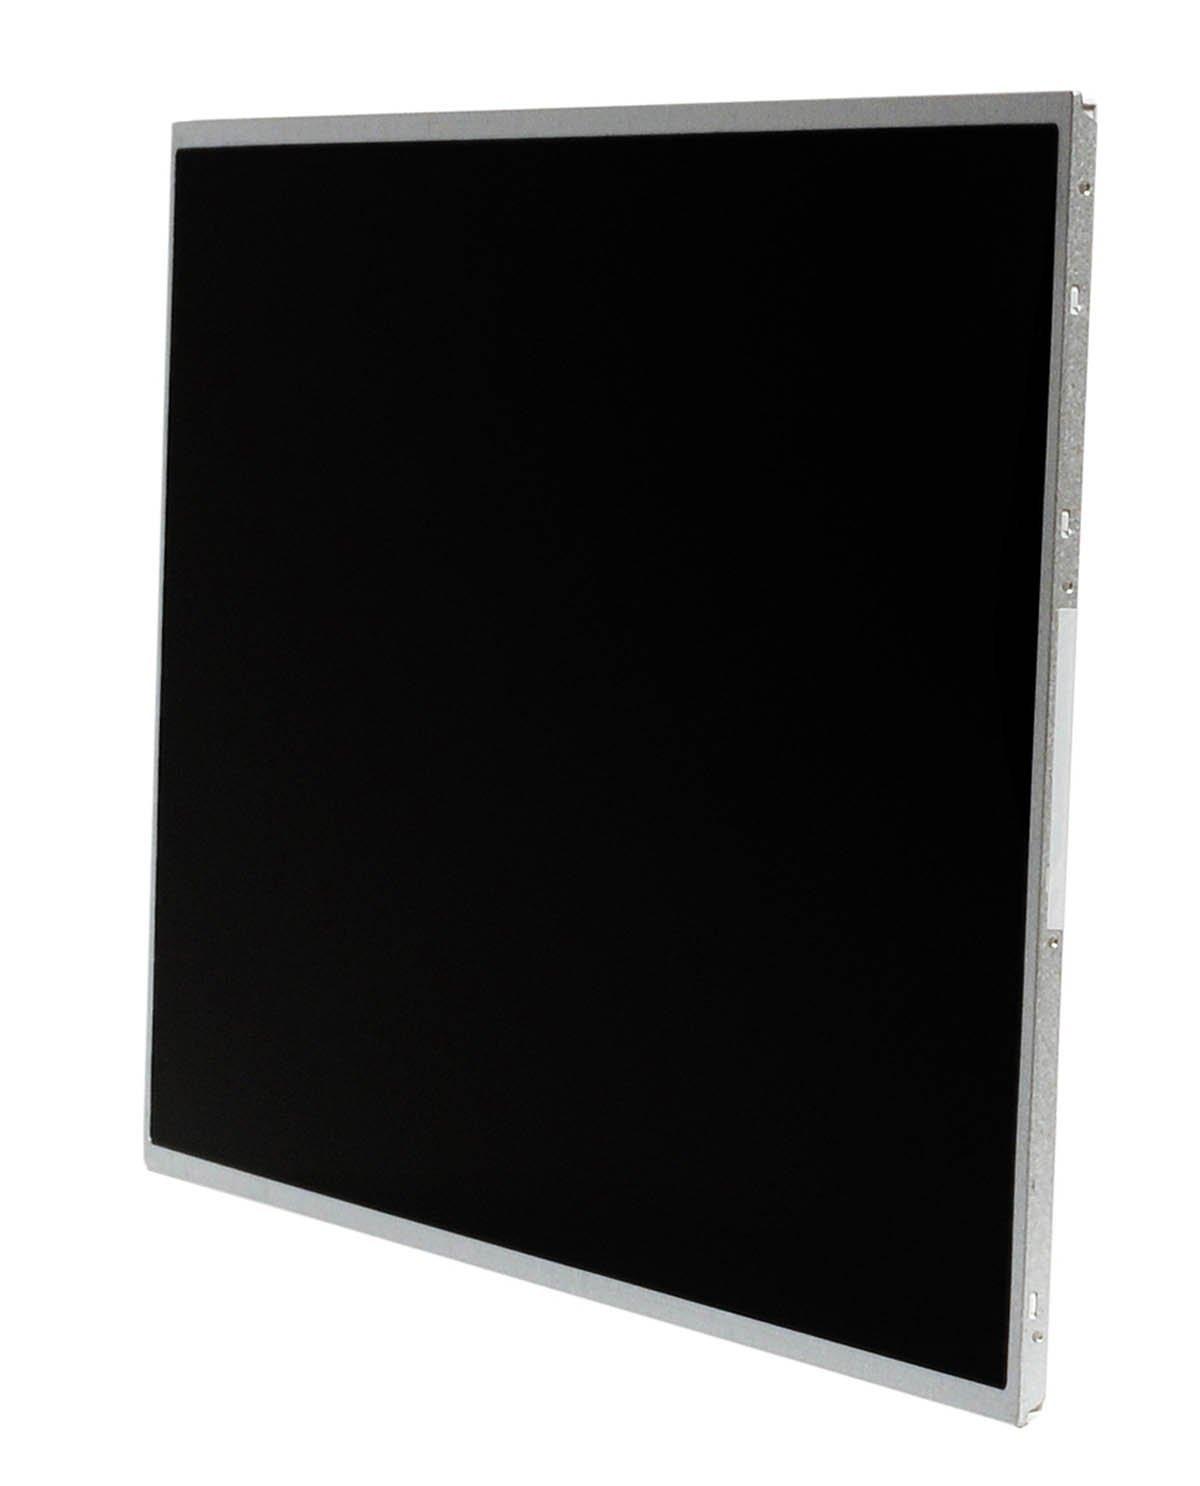 NEW DISPLAY FOR ASUS B53S-XS71 15.6 WXGA GLOSSY LCD SCREEN LED HD A+